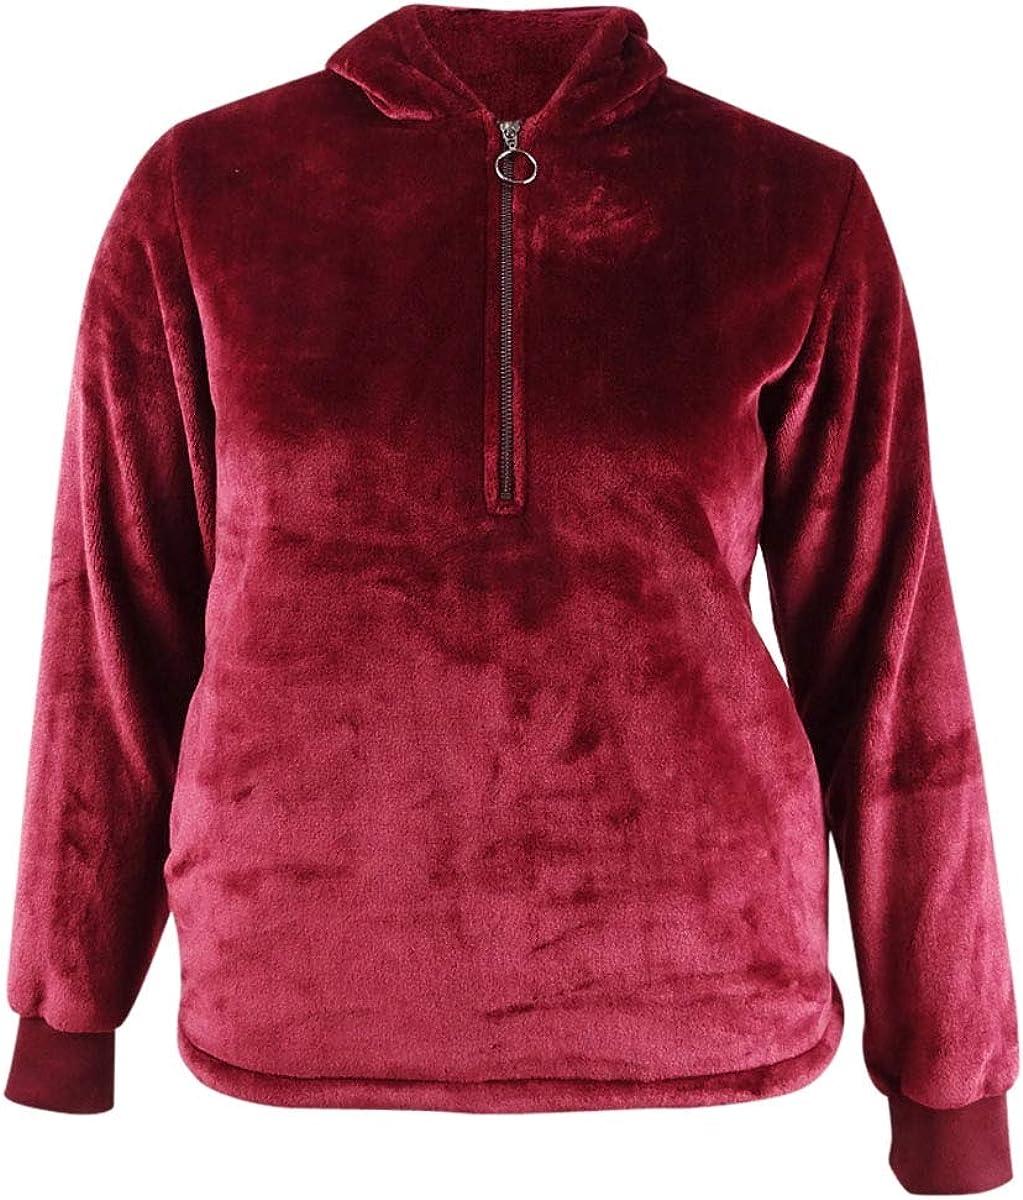 Ideology Womens Plus Fleece Cold Weather Velour Jacket